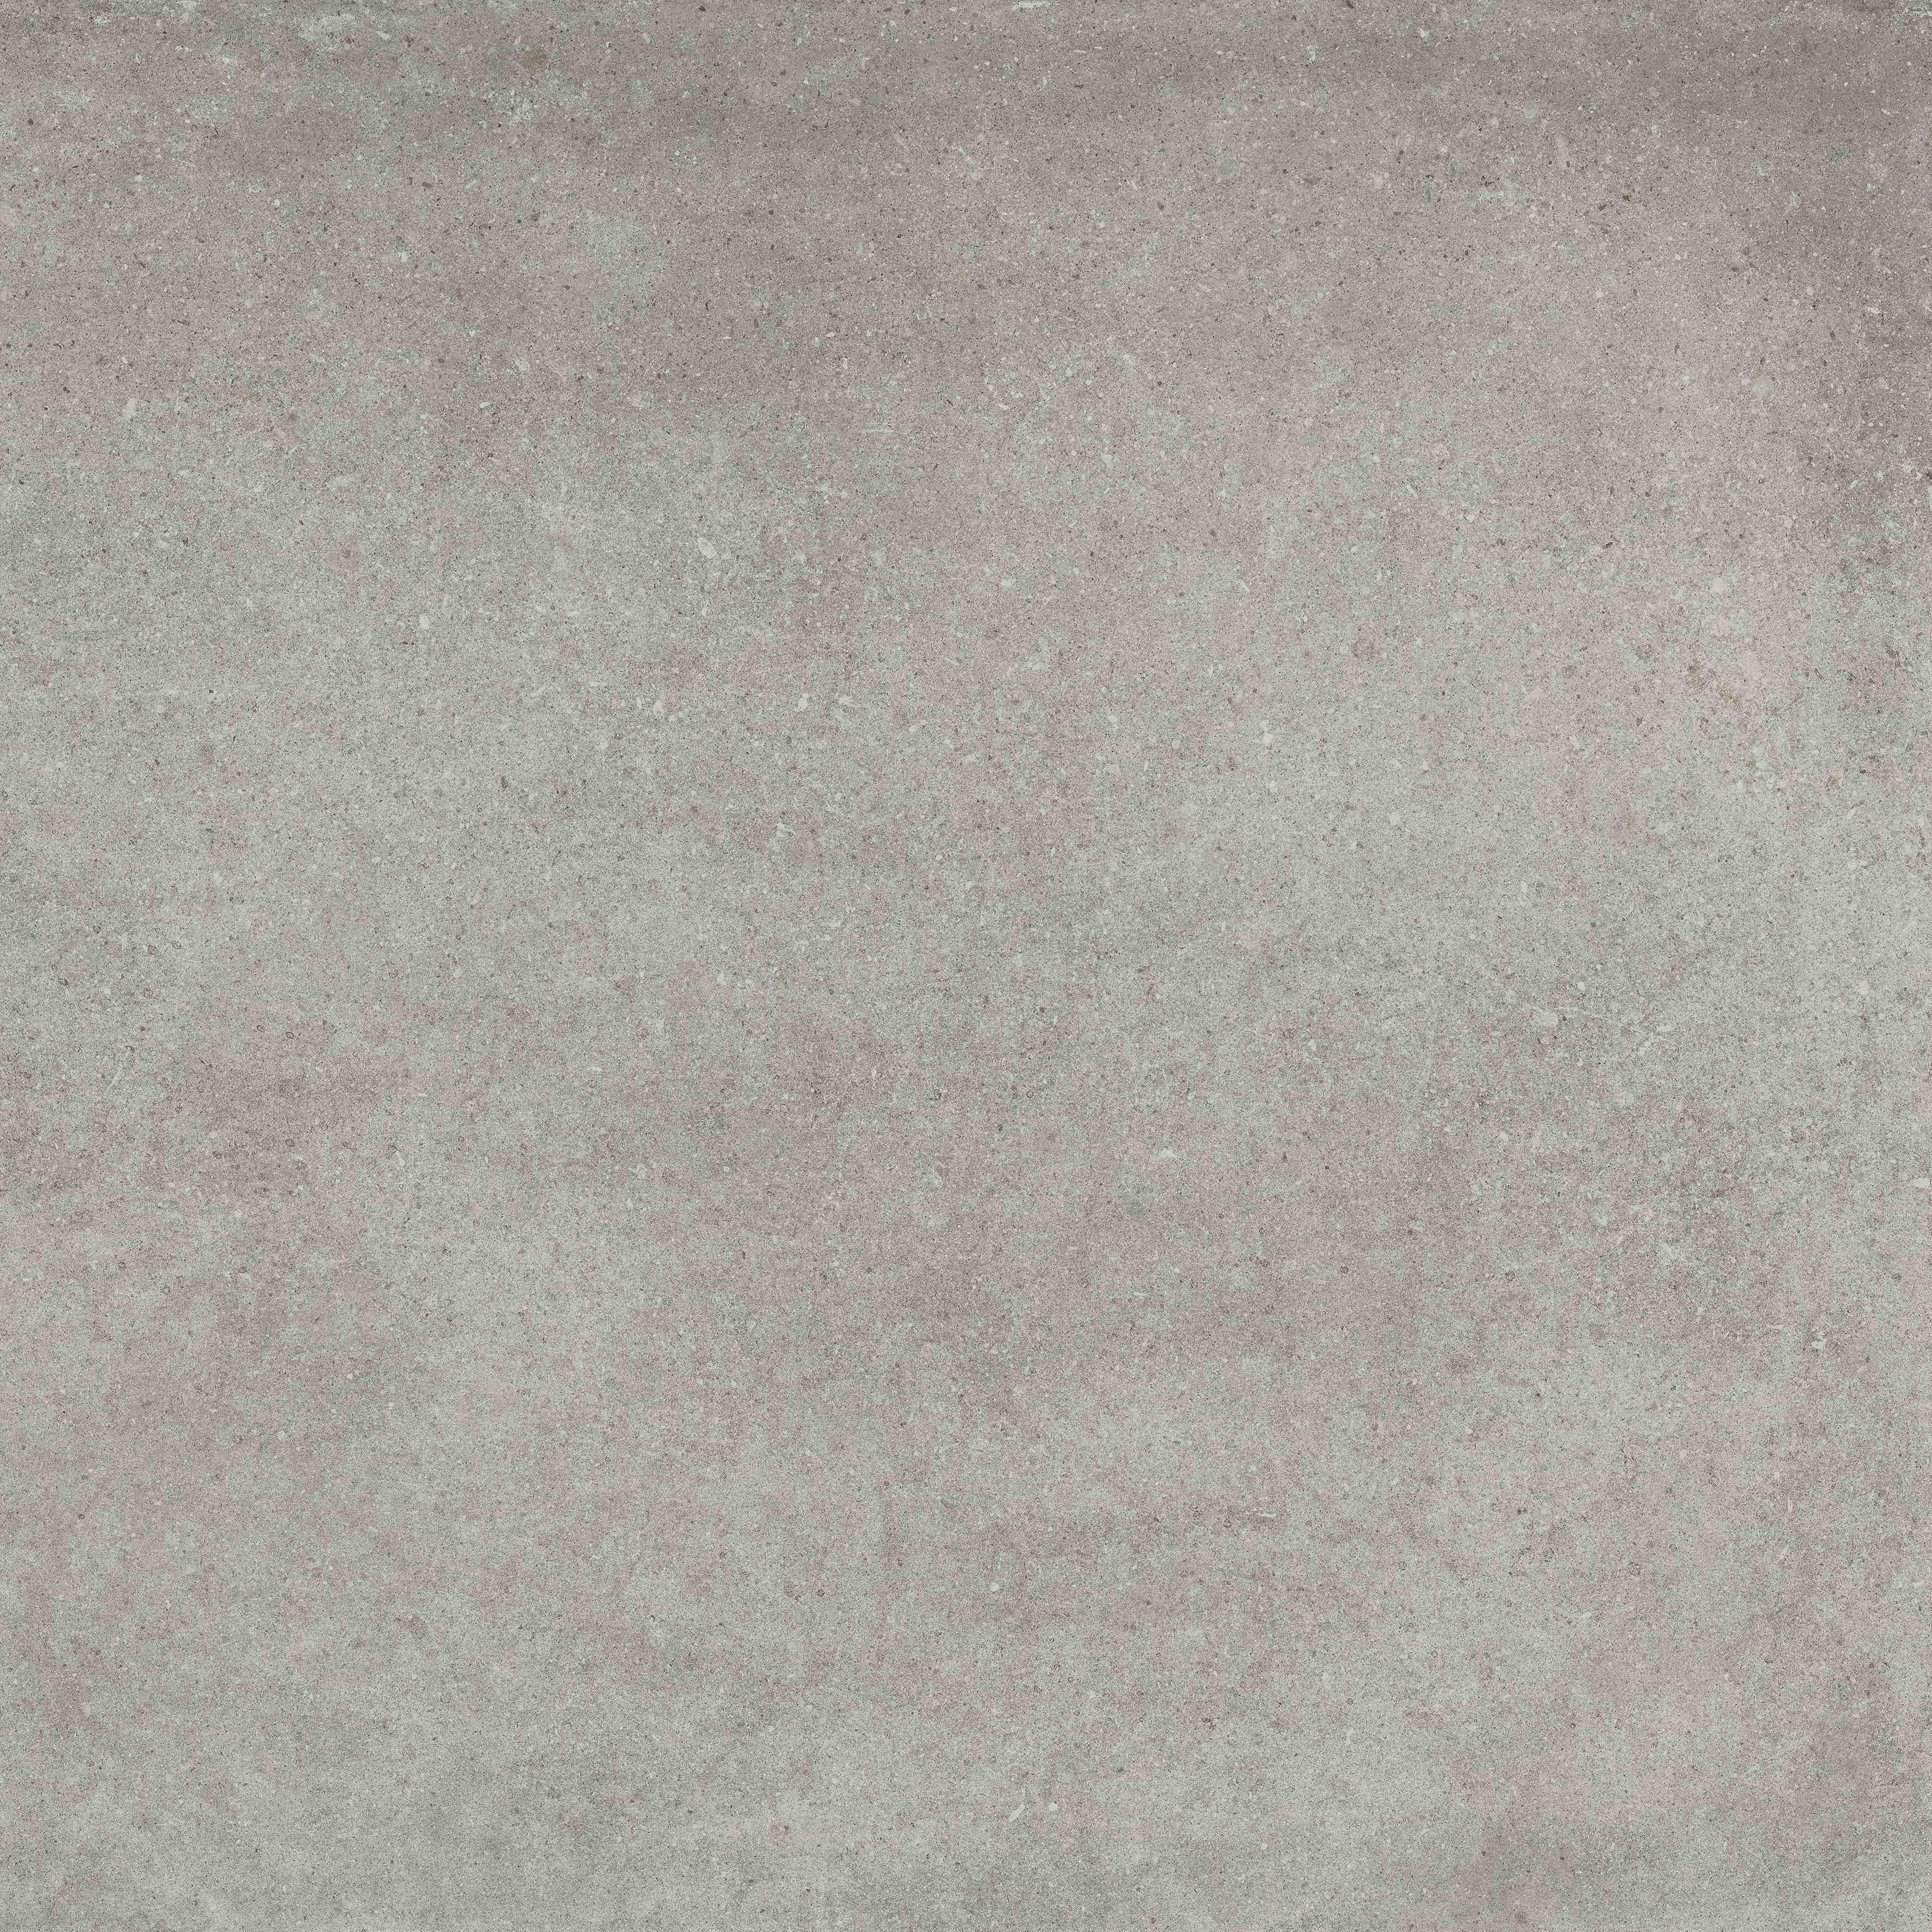 Плитка GRIGIO (ZRXRM8R) изображение 2